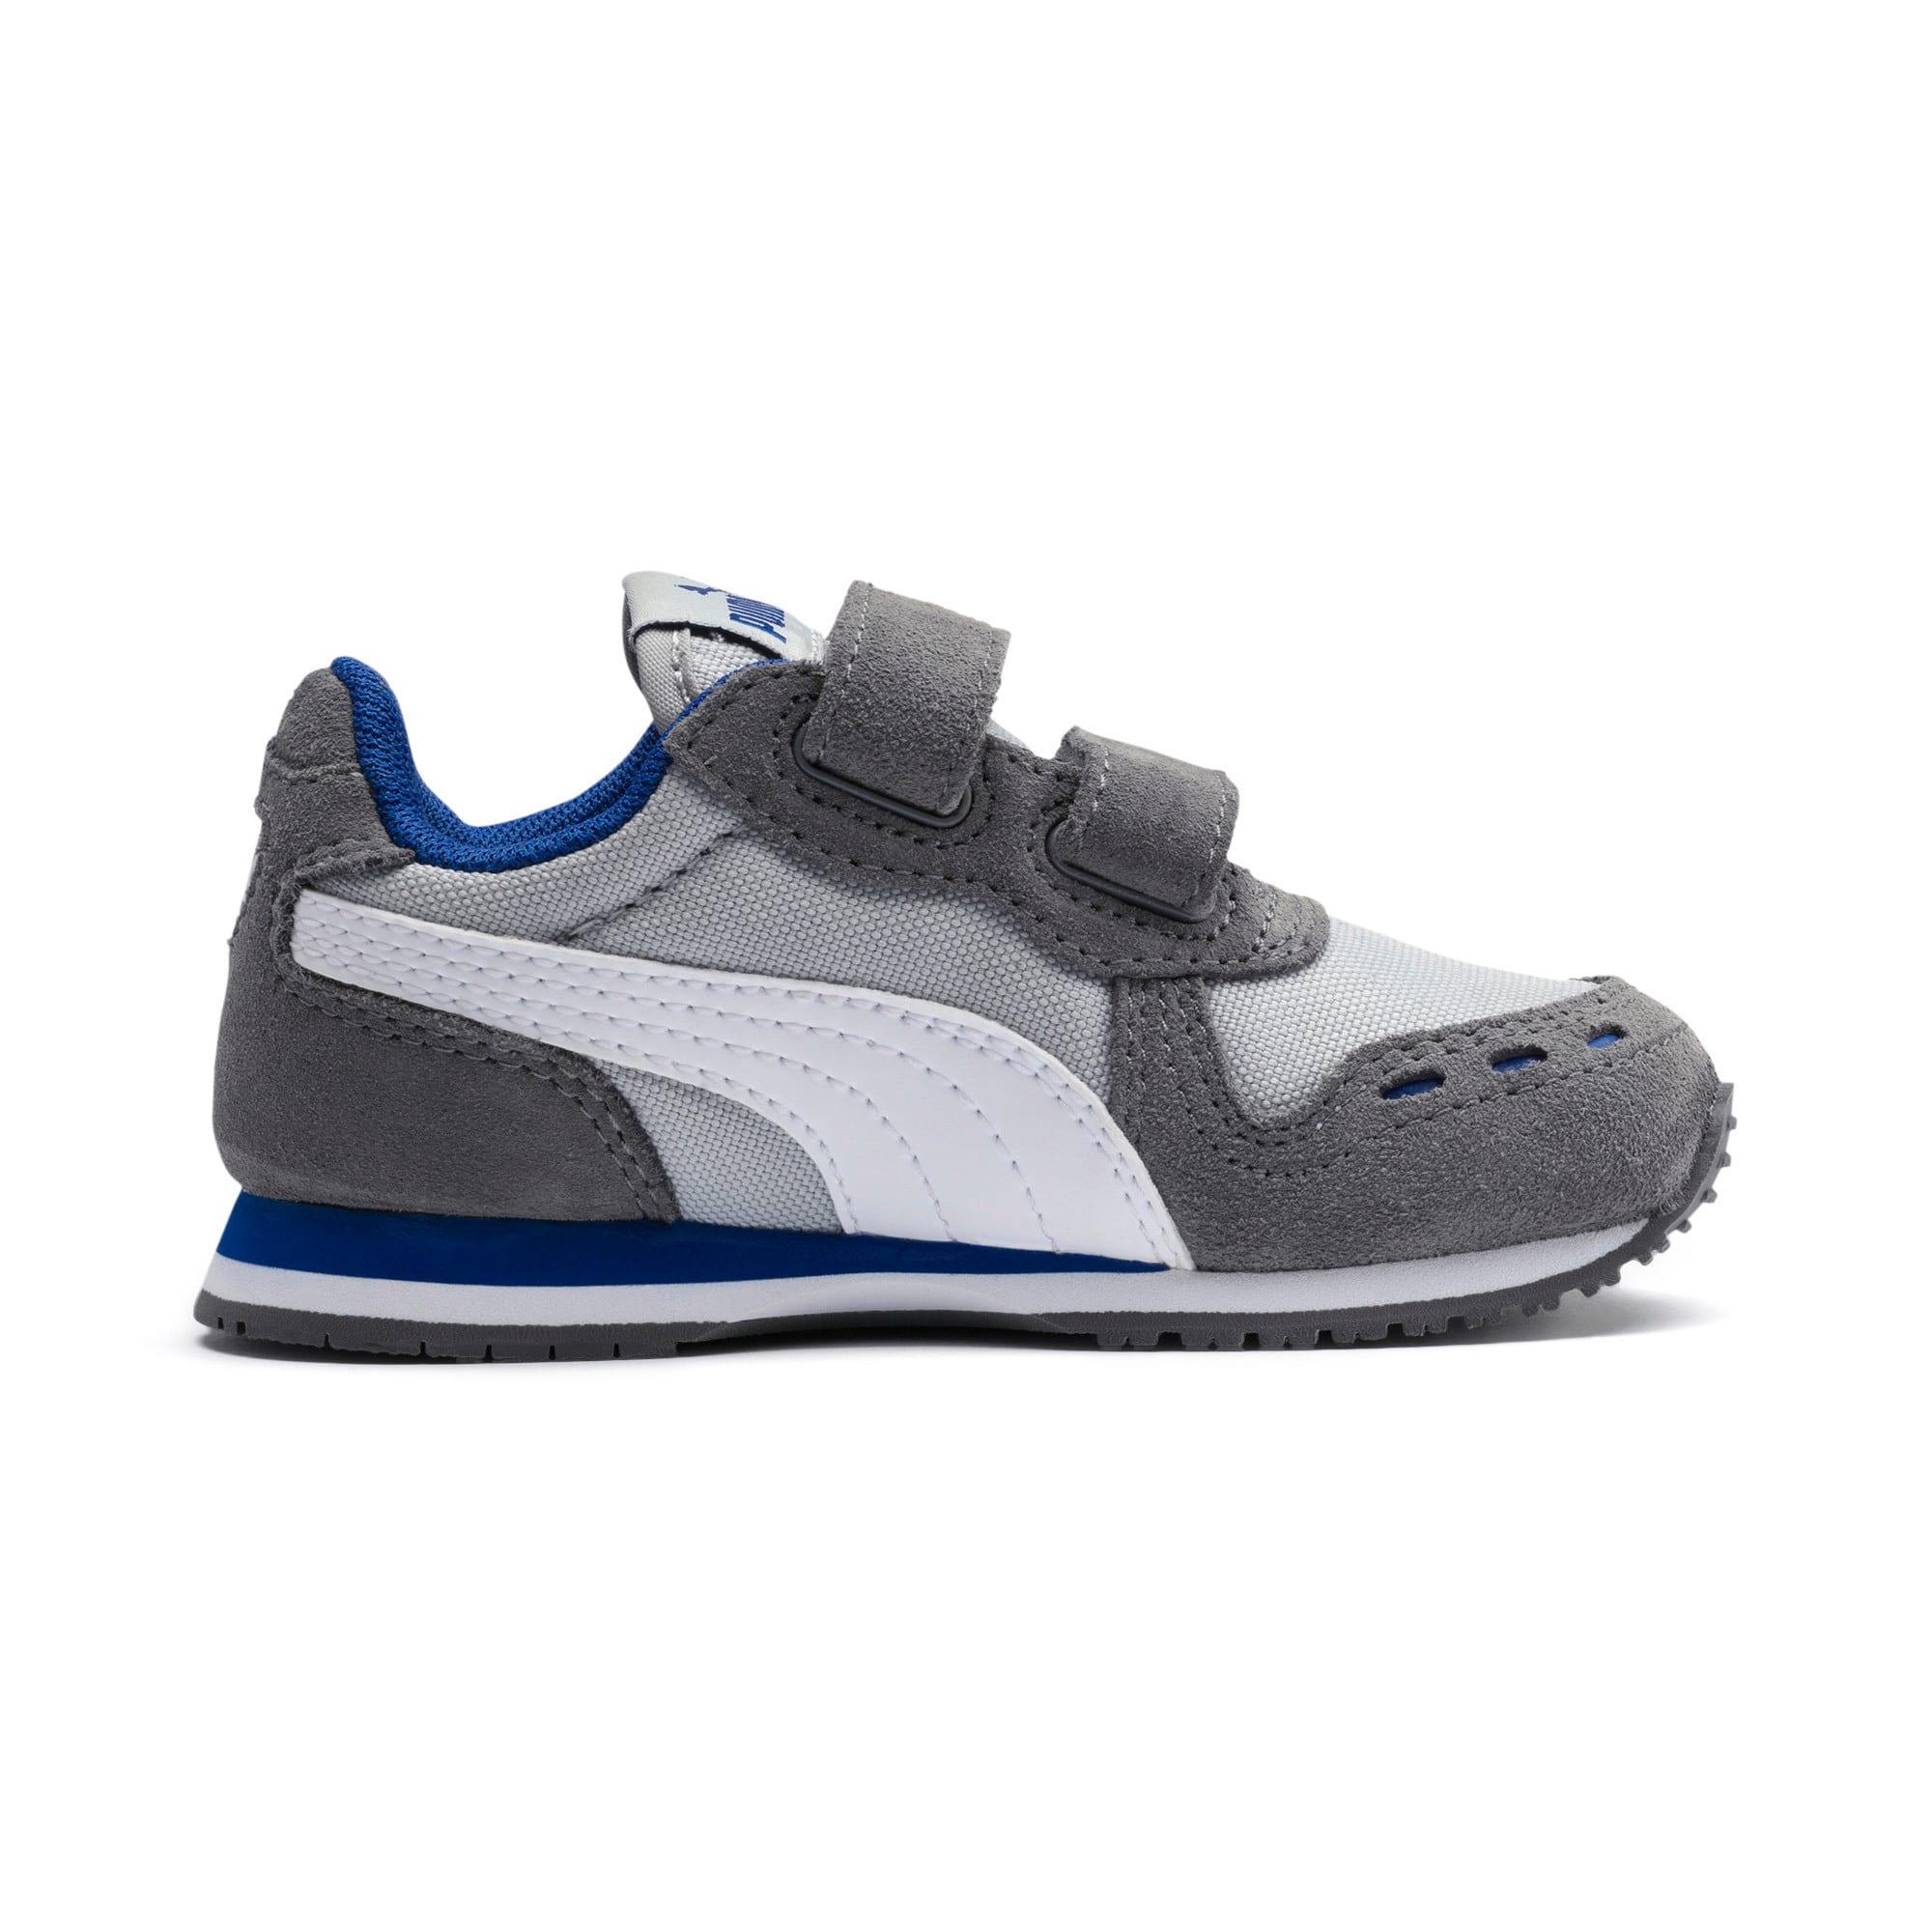 Thumbnail 5 of Cabana Racer Toddler Shoes, High Rise-CASTLEROCK, medium